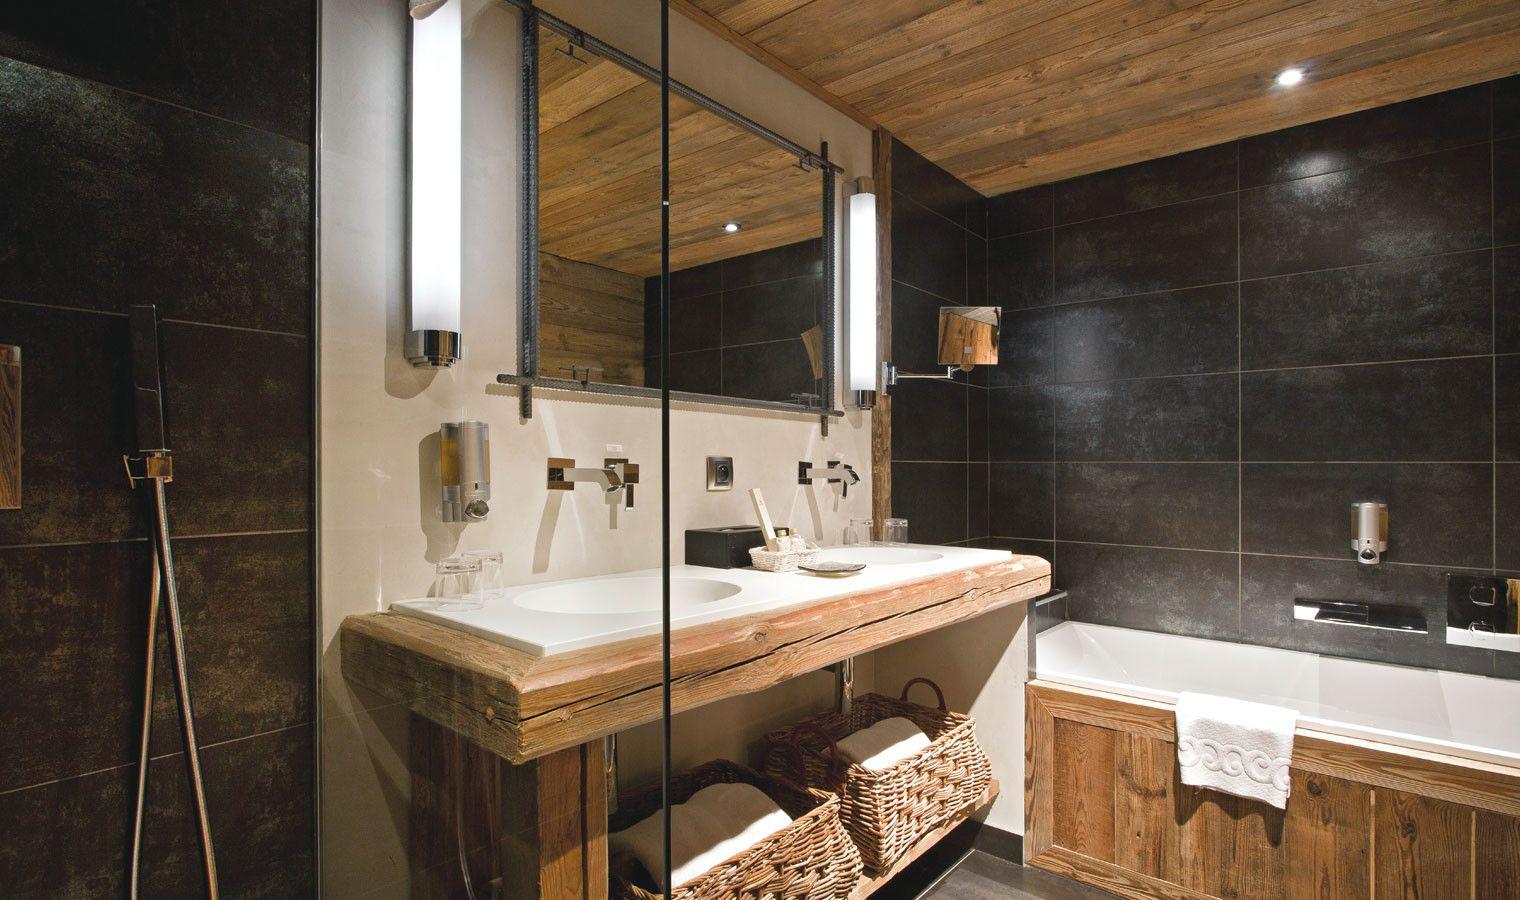 Salle De Bain Moderne Avec Baignoire ~ Salle de bain 1 une 7m2 ...